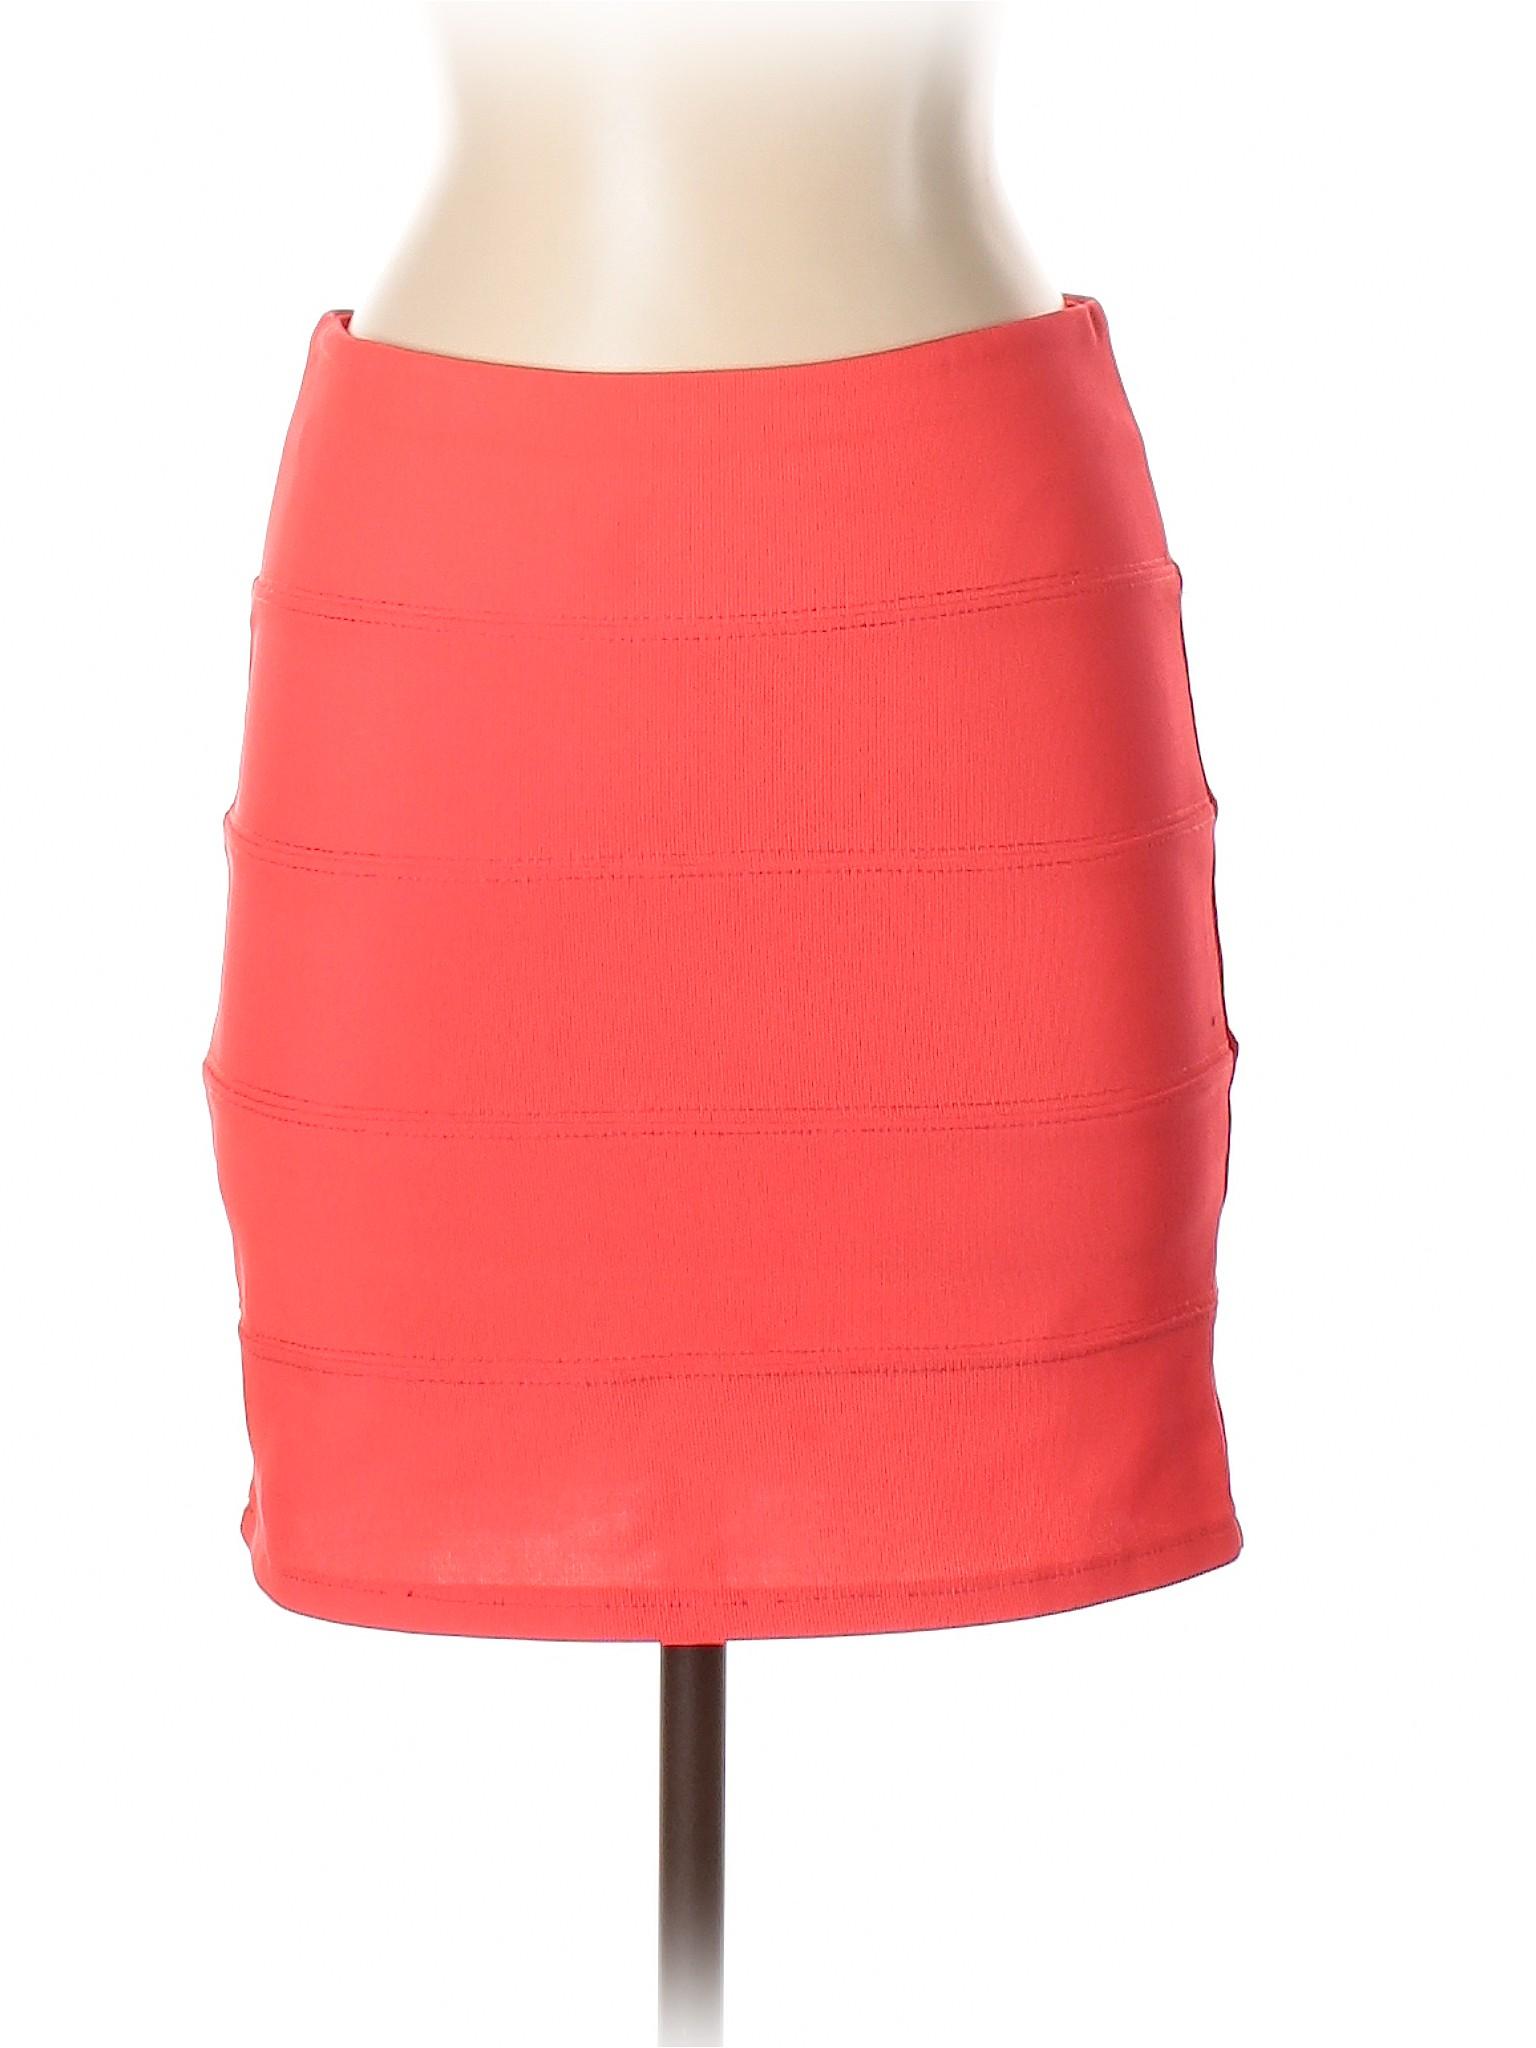 Skirt Boutique Millau Millau Casual Boutique waO7q0